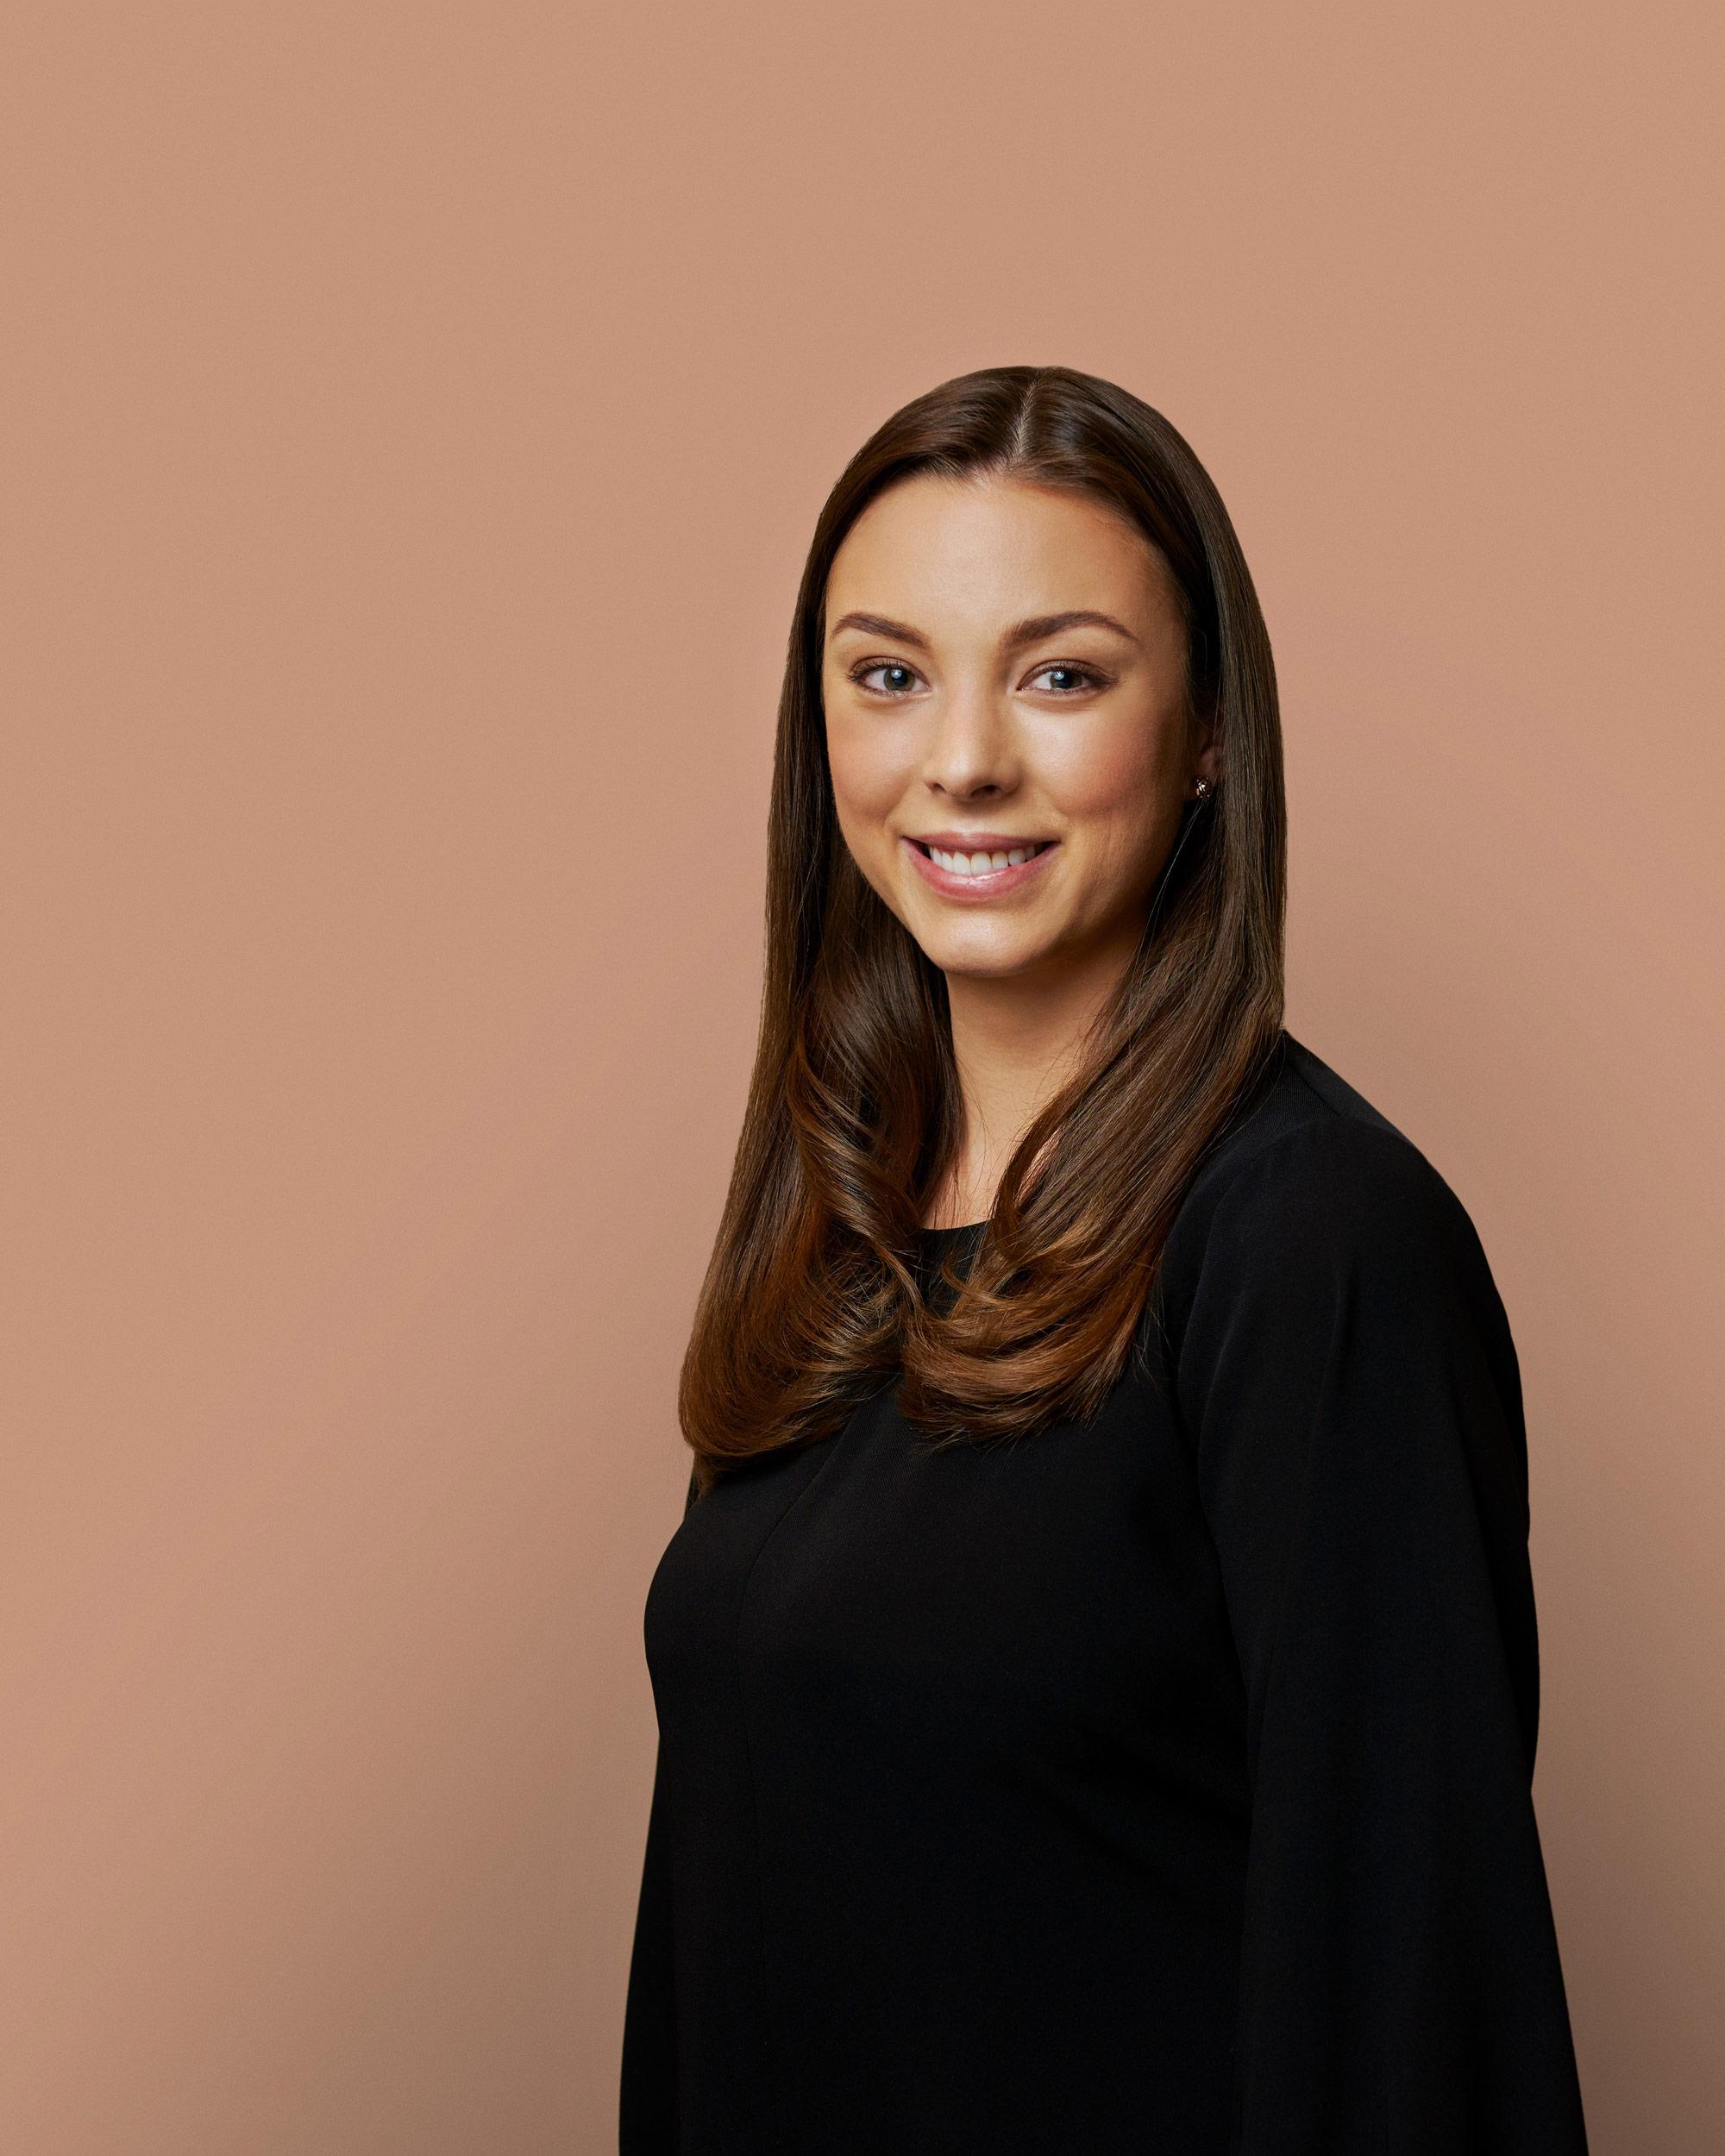 Emelie Söderberg